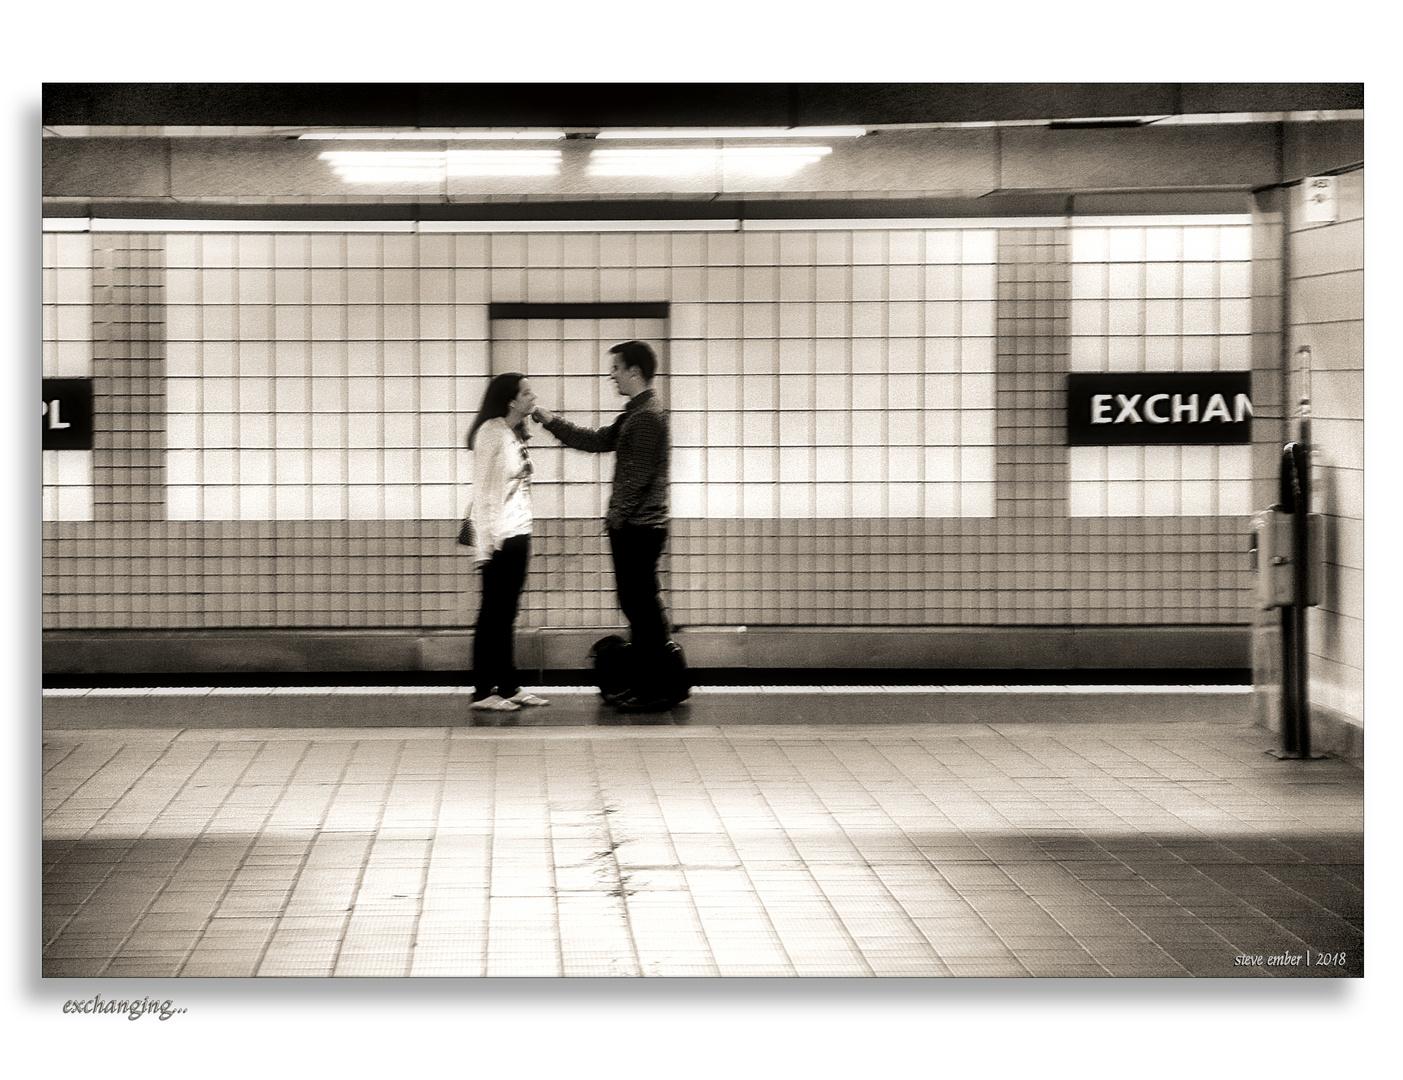 Exchanging...